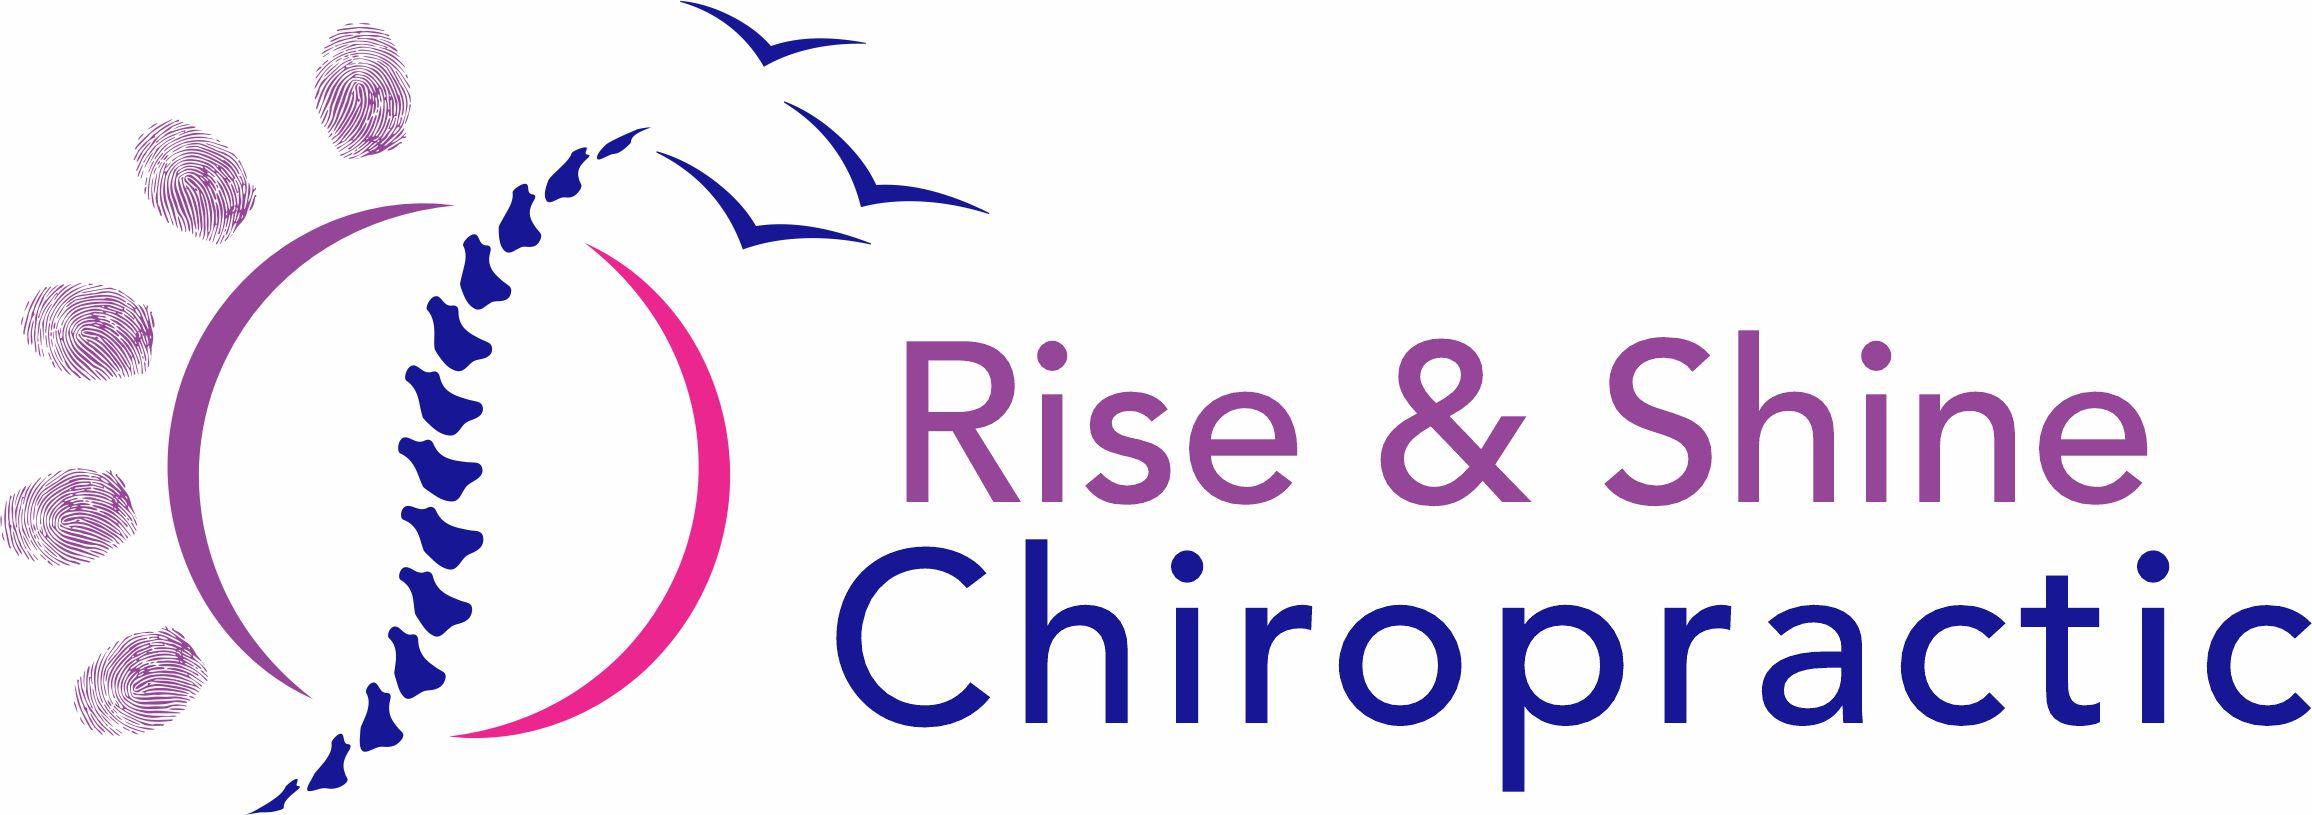 Rise & Shine Chiropractic